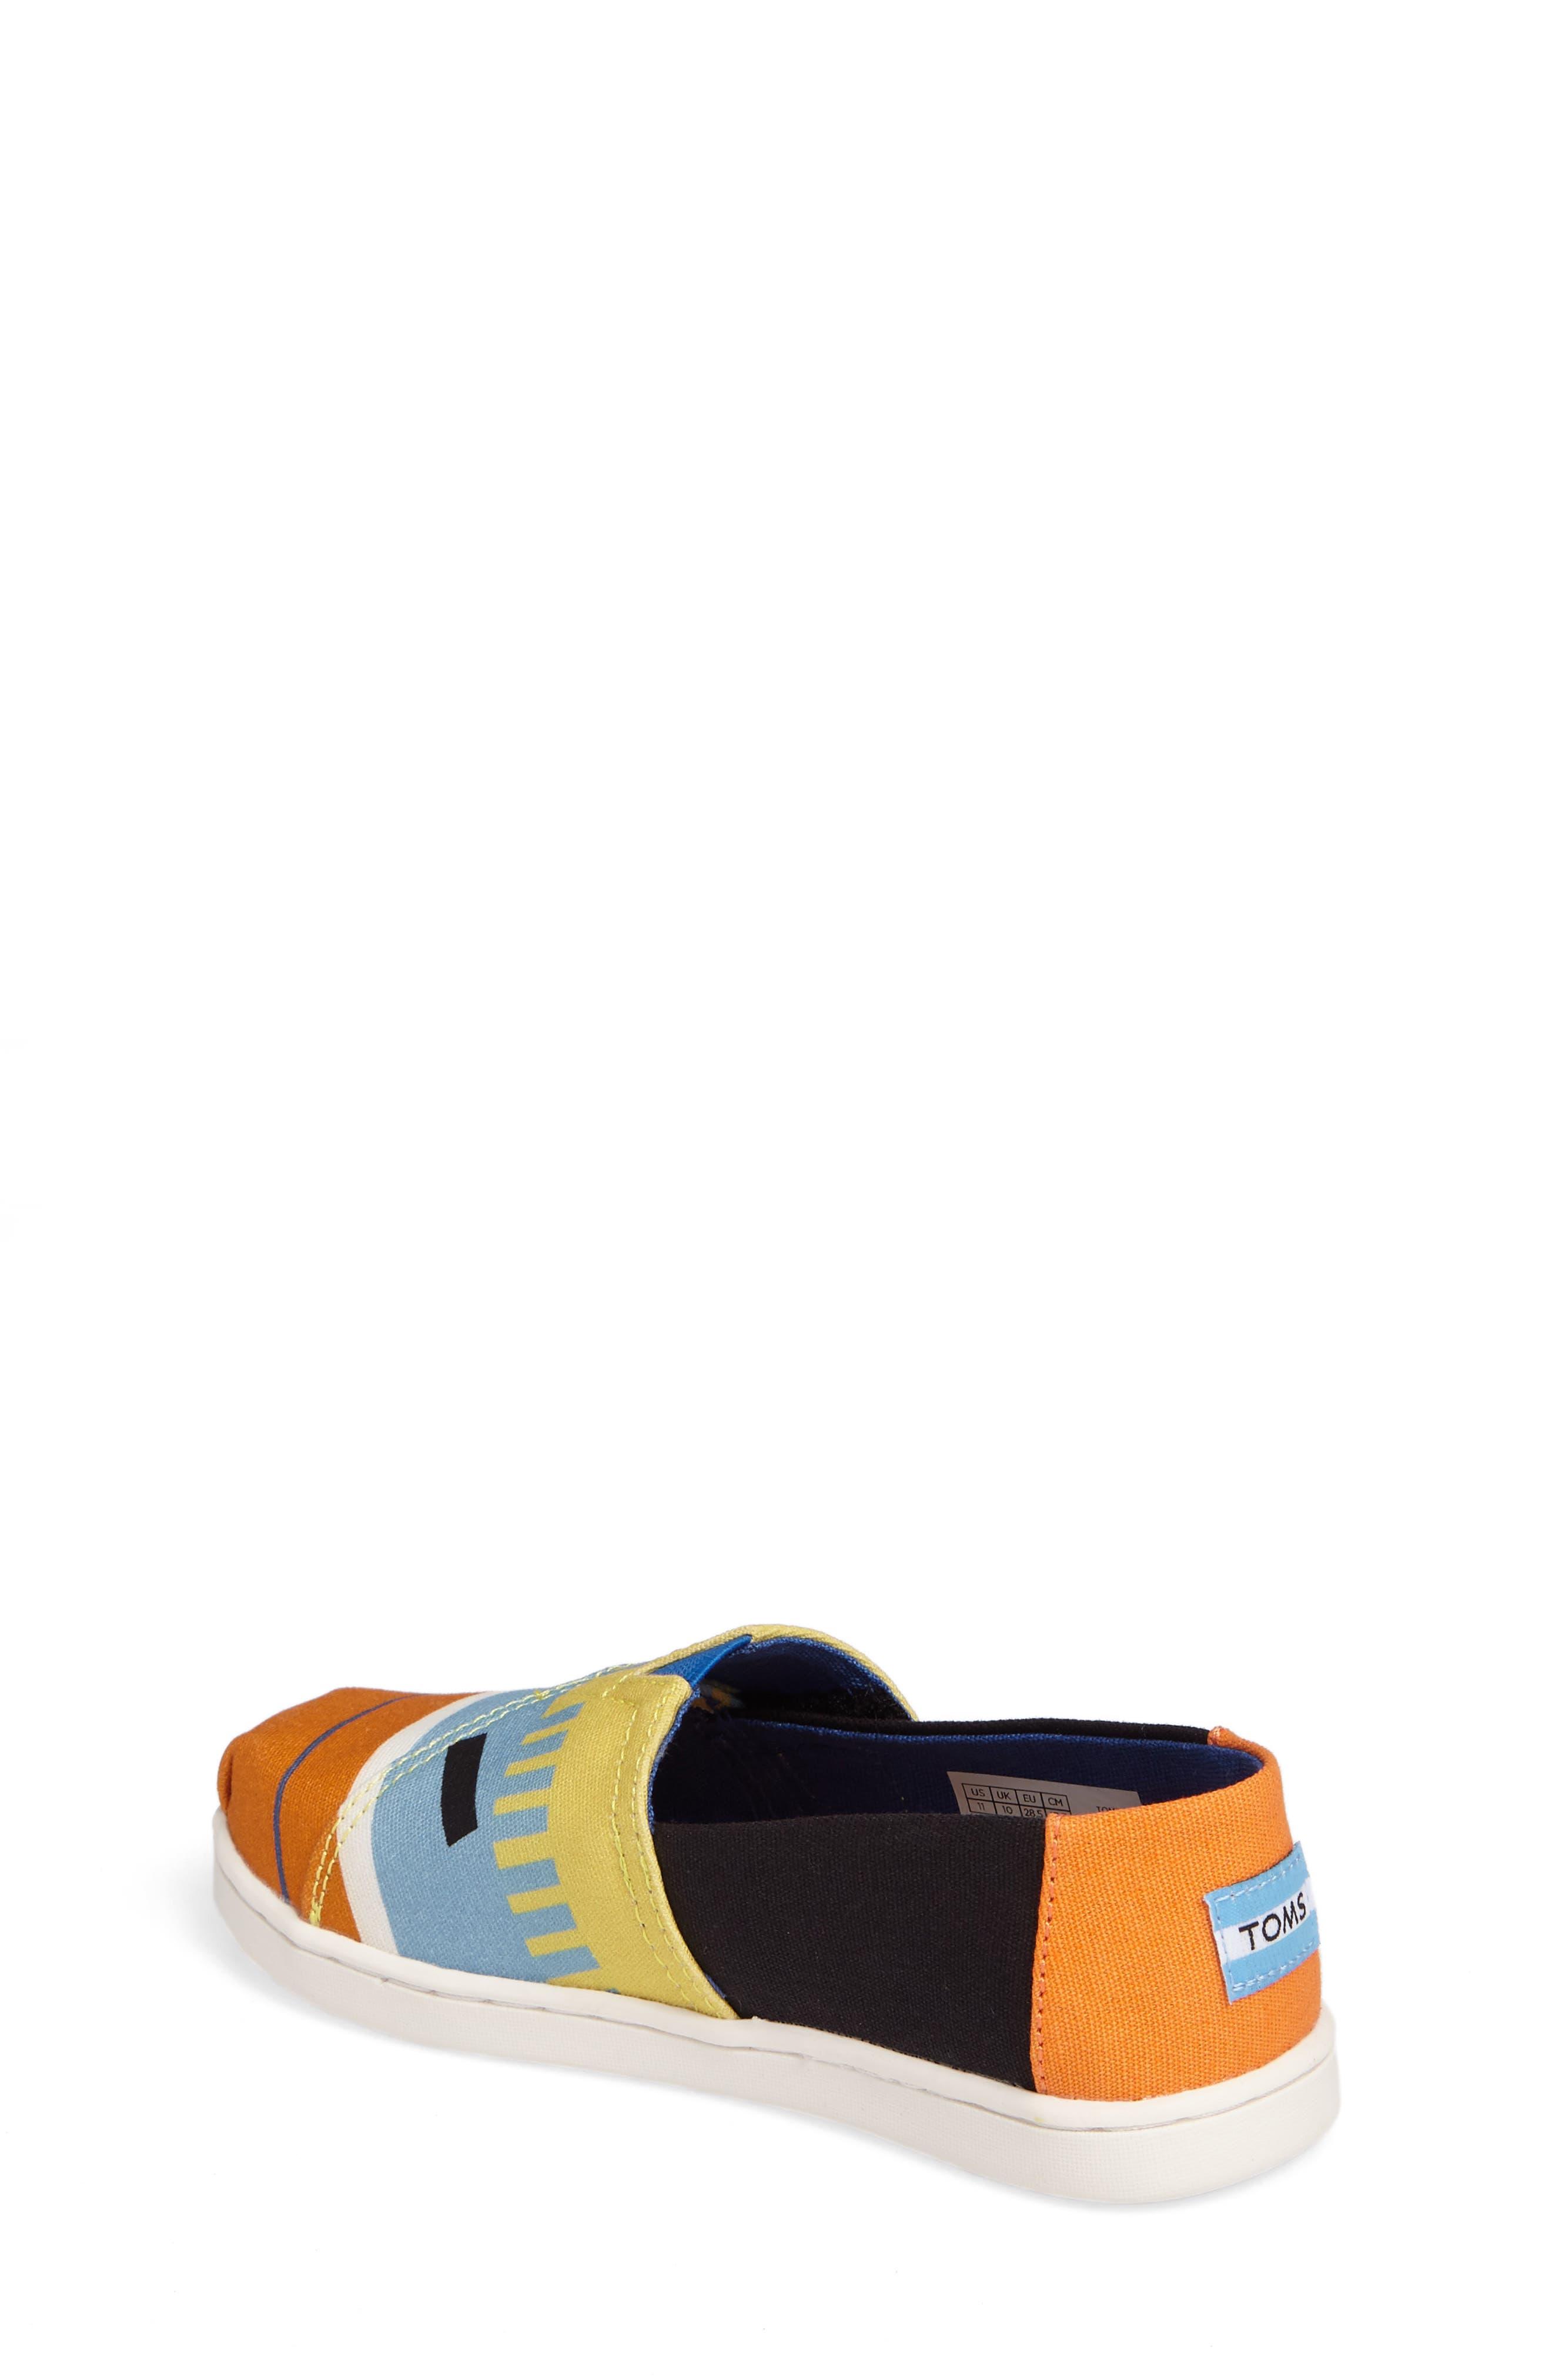 rosettes crib oshkosh braided toddler shoes cribs rosette pin toms and girl sandals